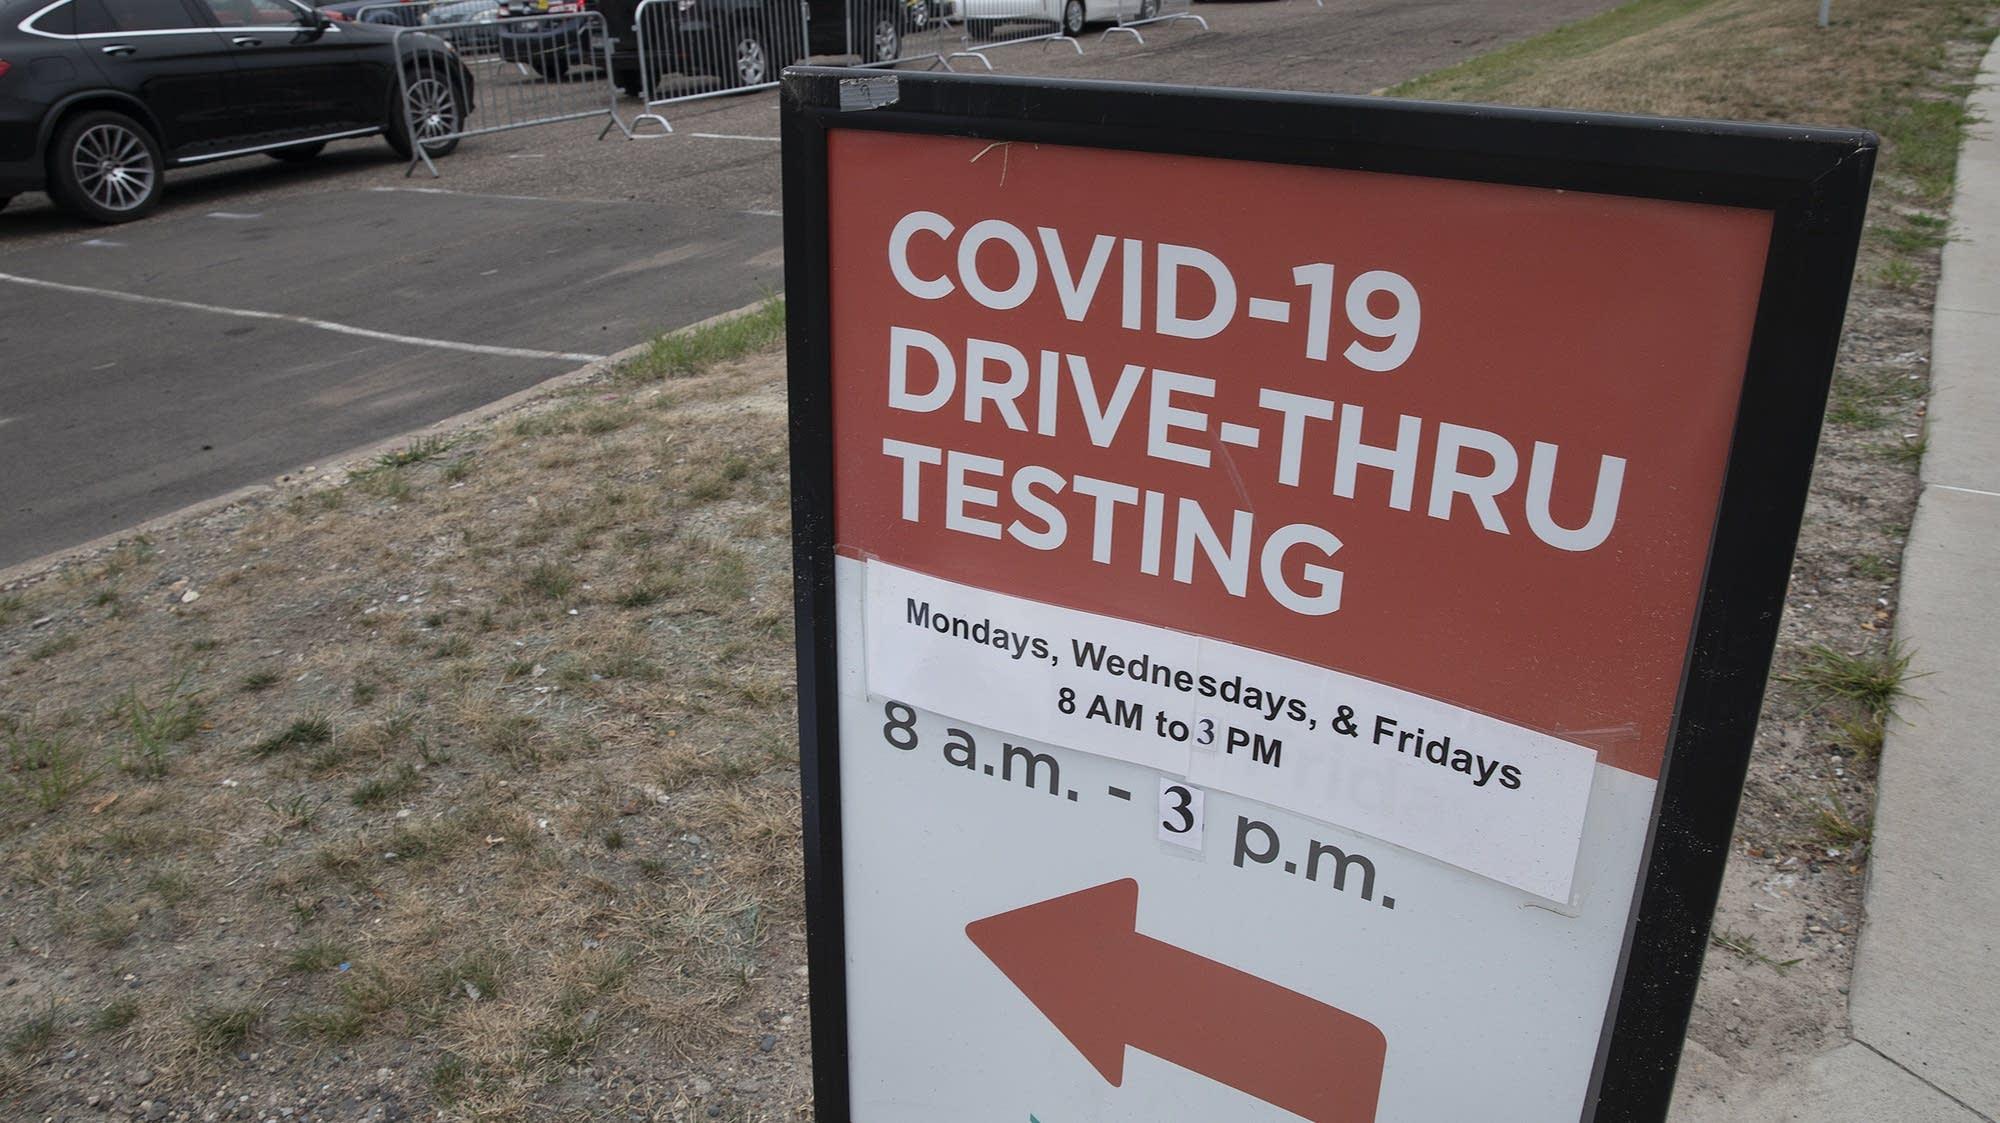 Latest on COVID-19 in Minnesota